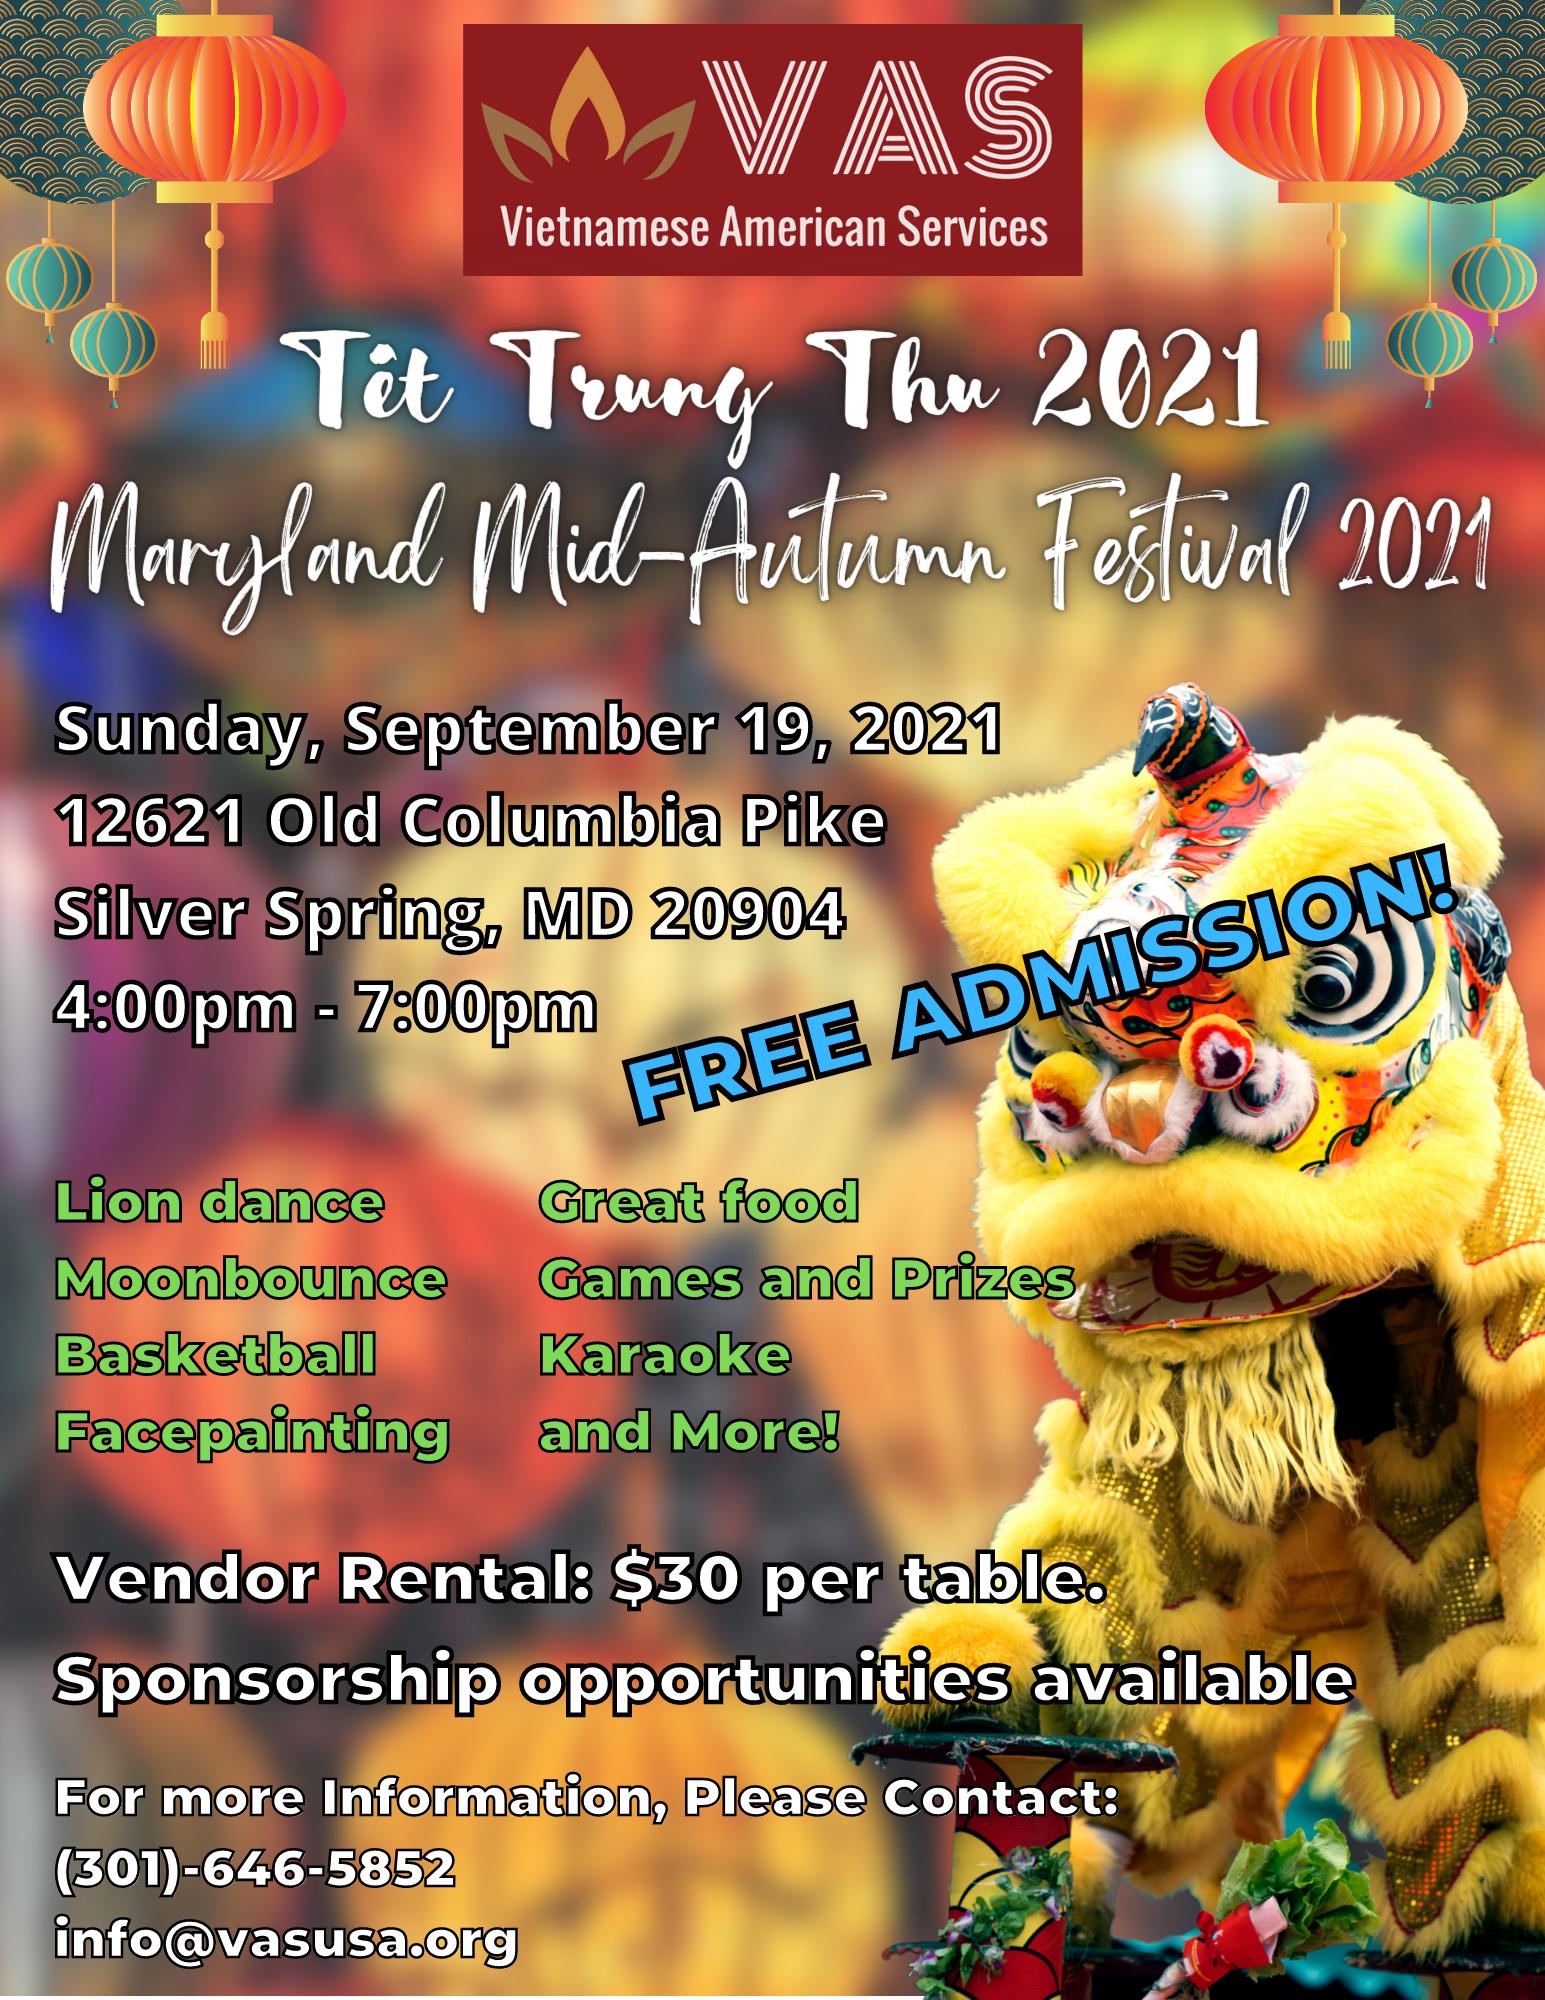 Mid-Autumn Festival at VAS. September 19, 2021 4pm - 7pm